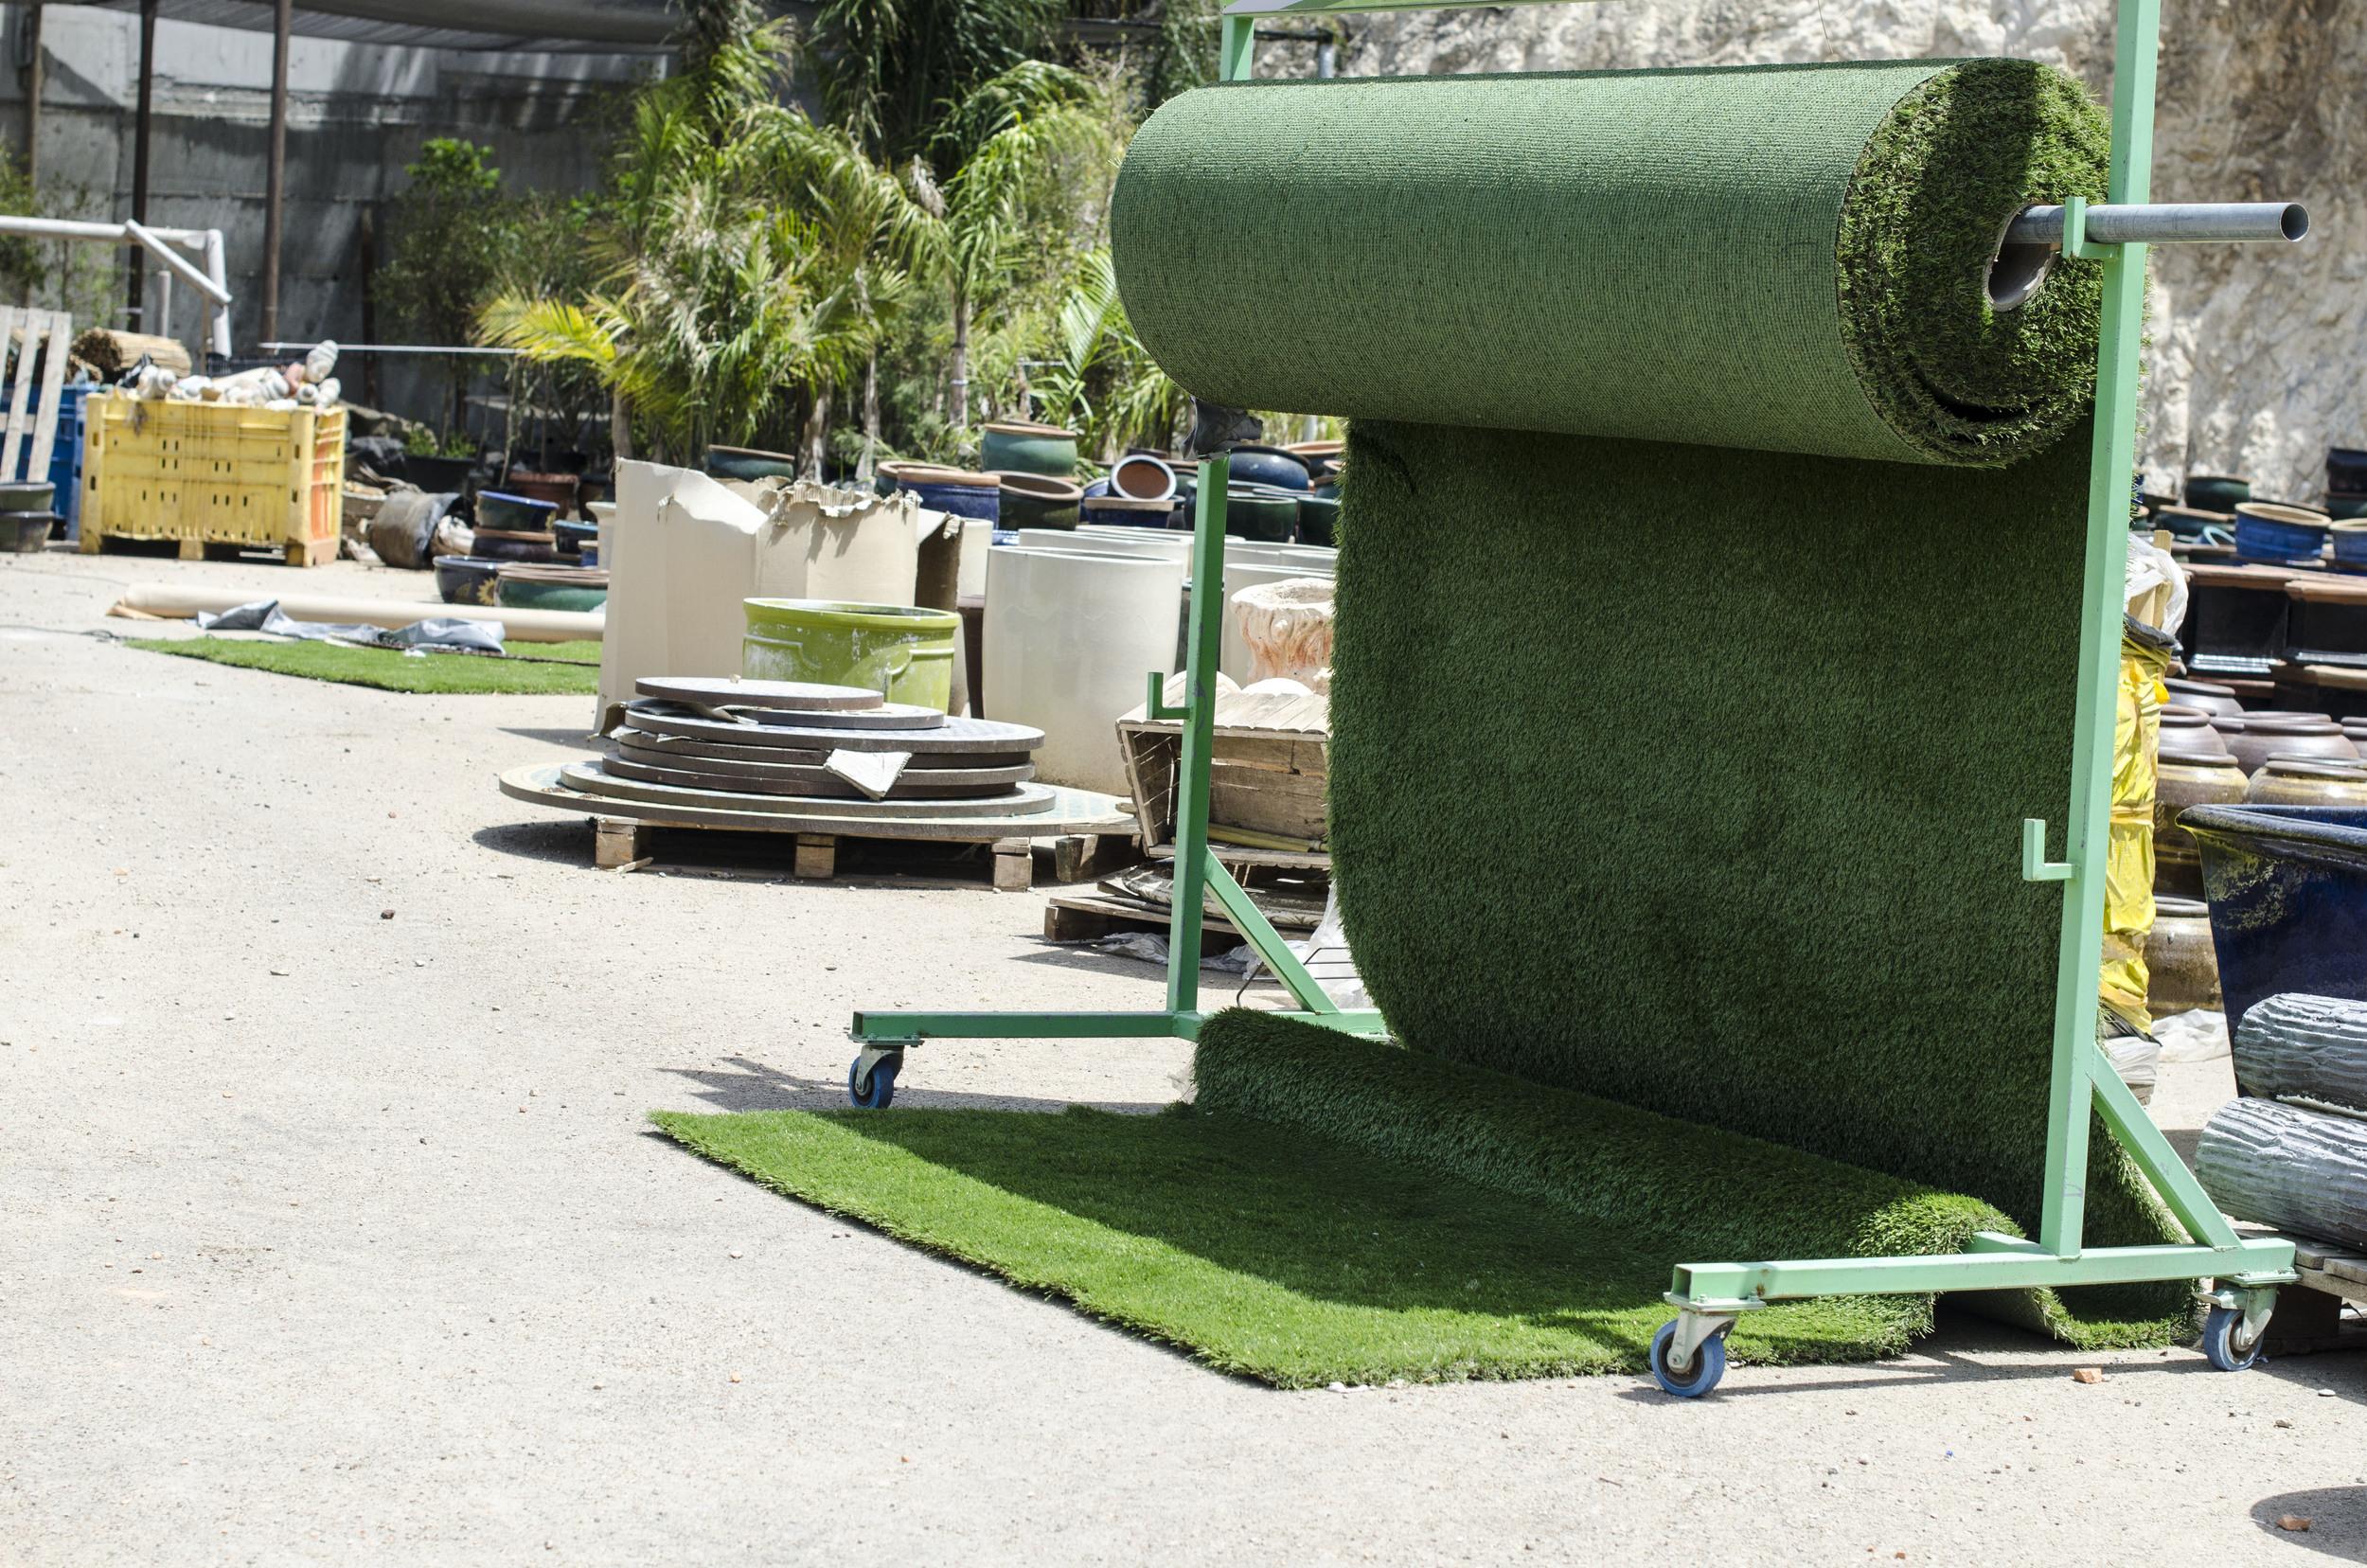 Fake green grass.